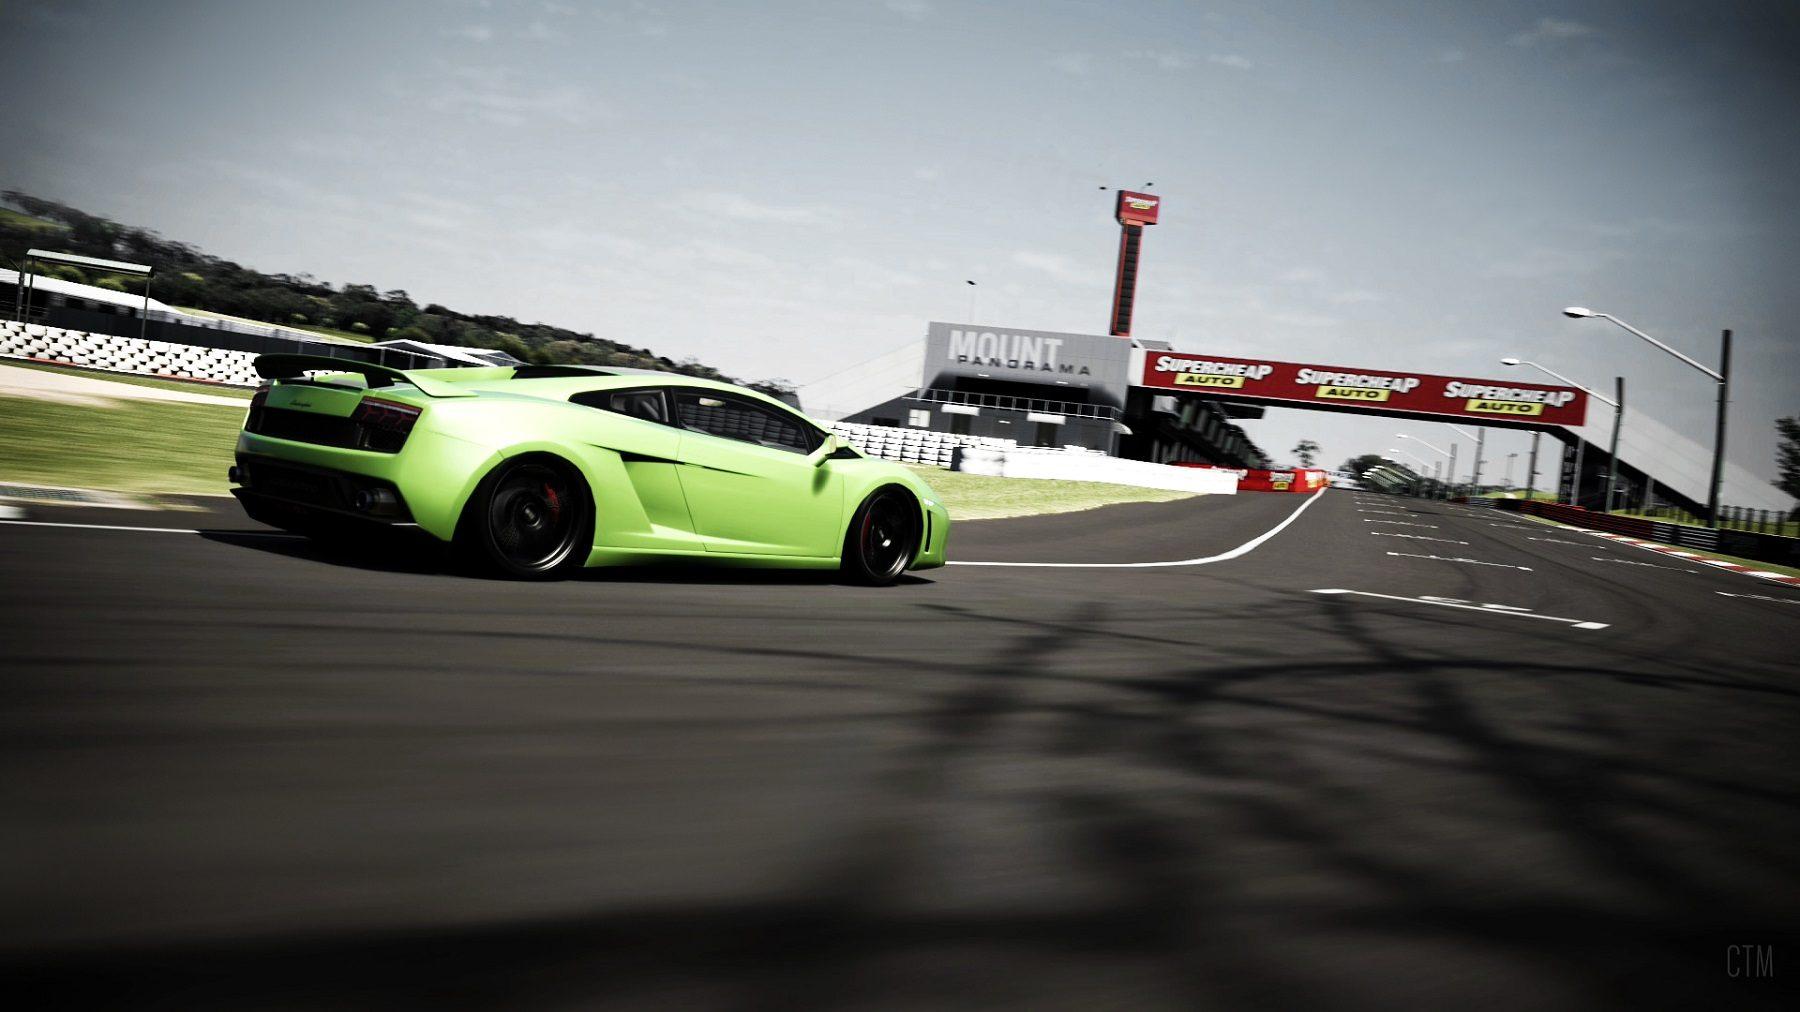 Mount Panorama Motor Racing Edit_1_small.jpg